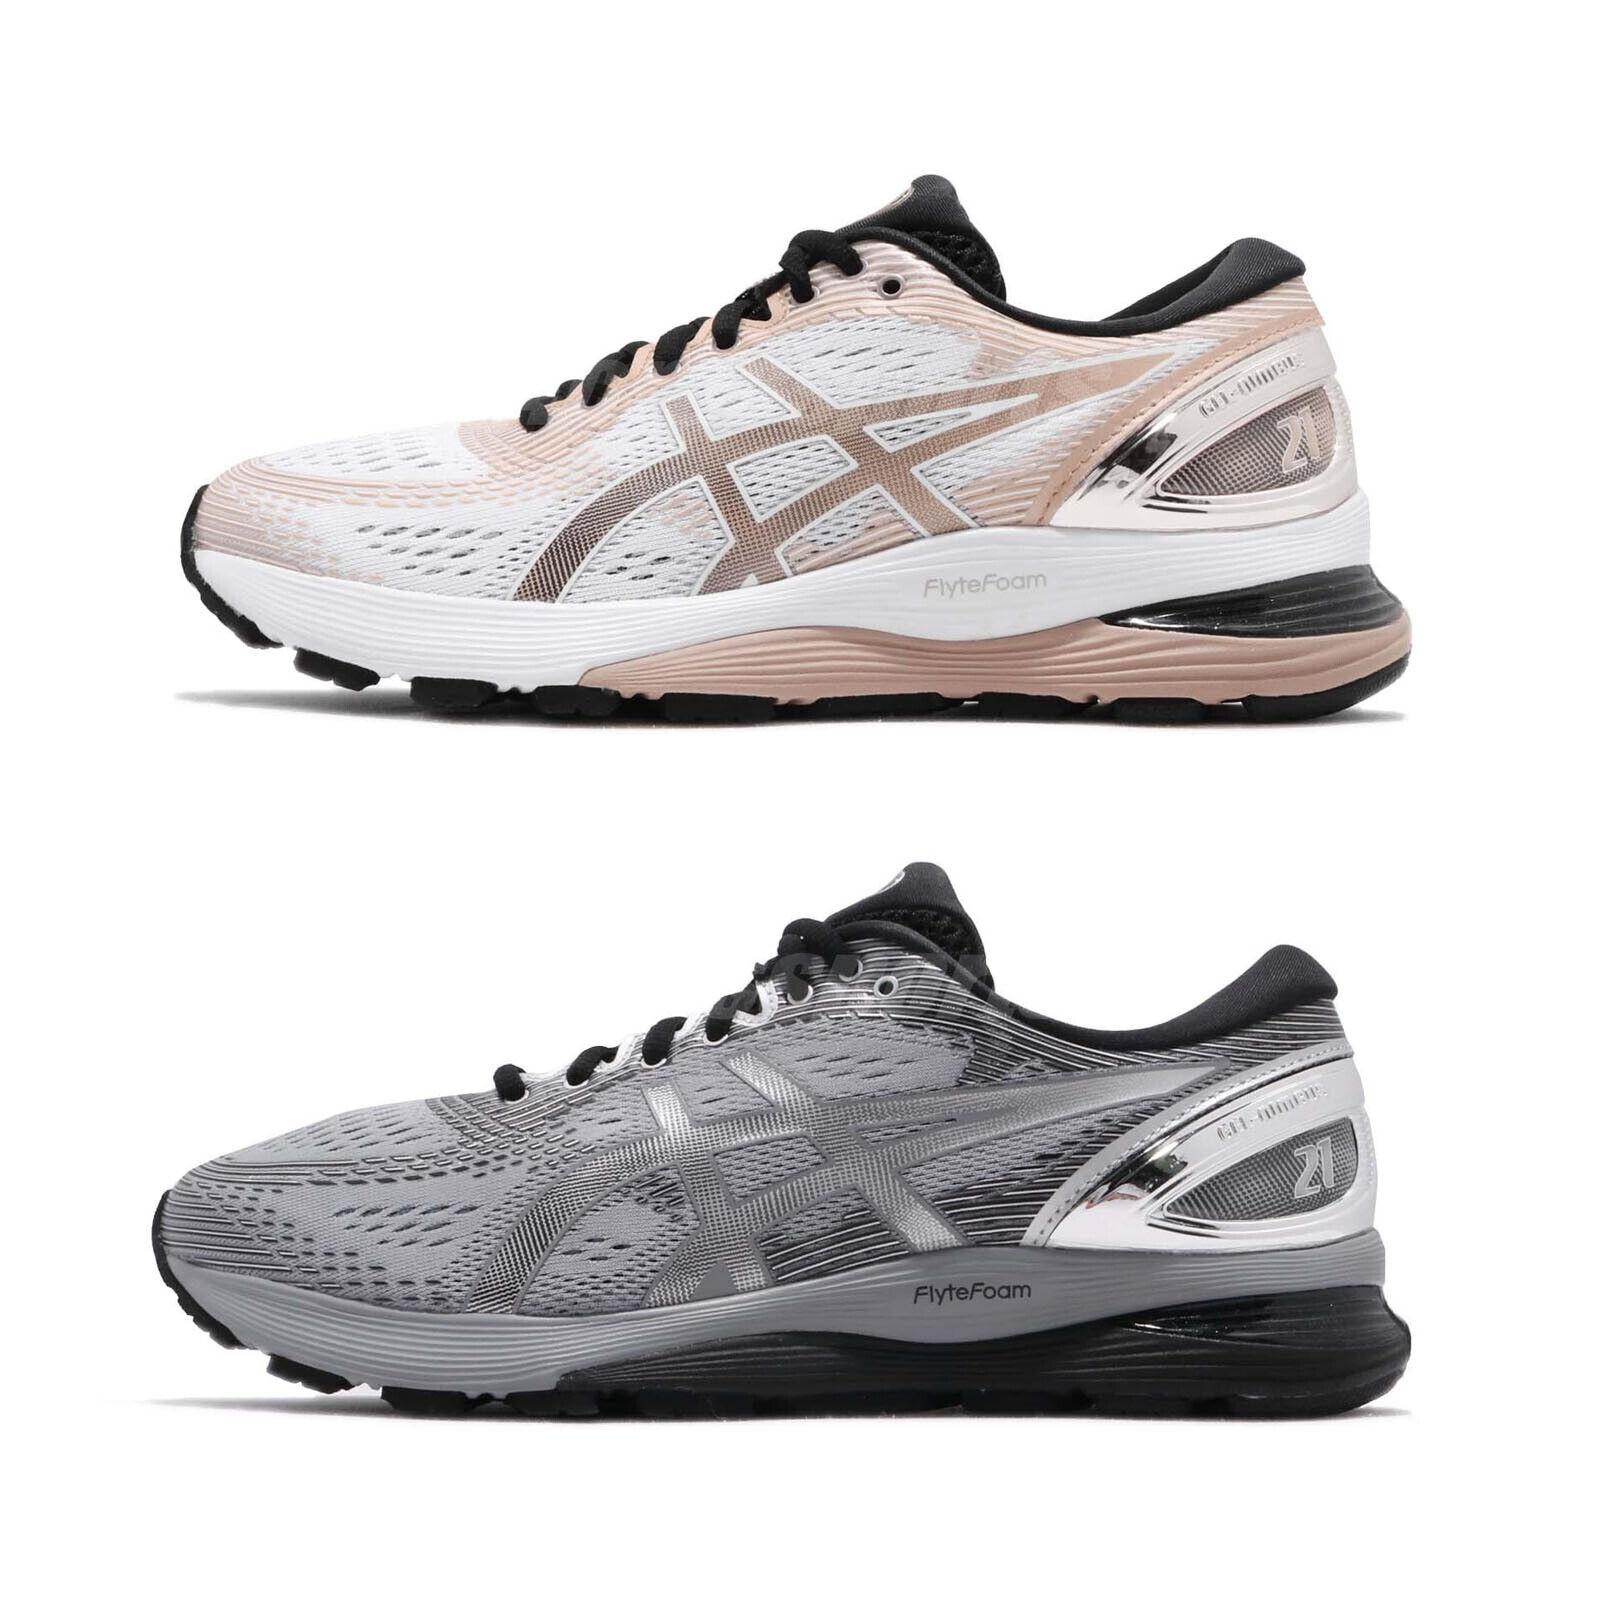 Asics Gel-Nimbus 21 Platinum Mens mujer Running zapatos zapatillas Pick 1